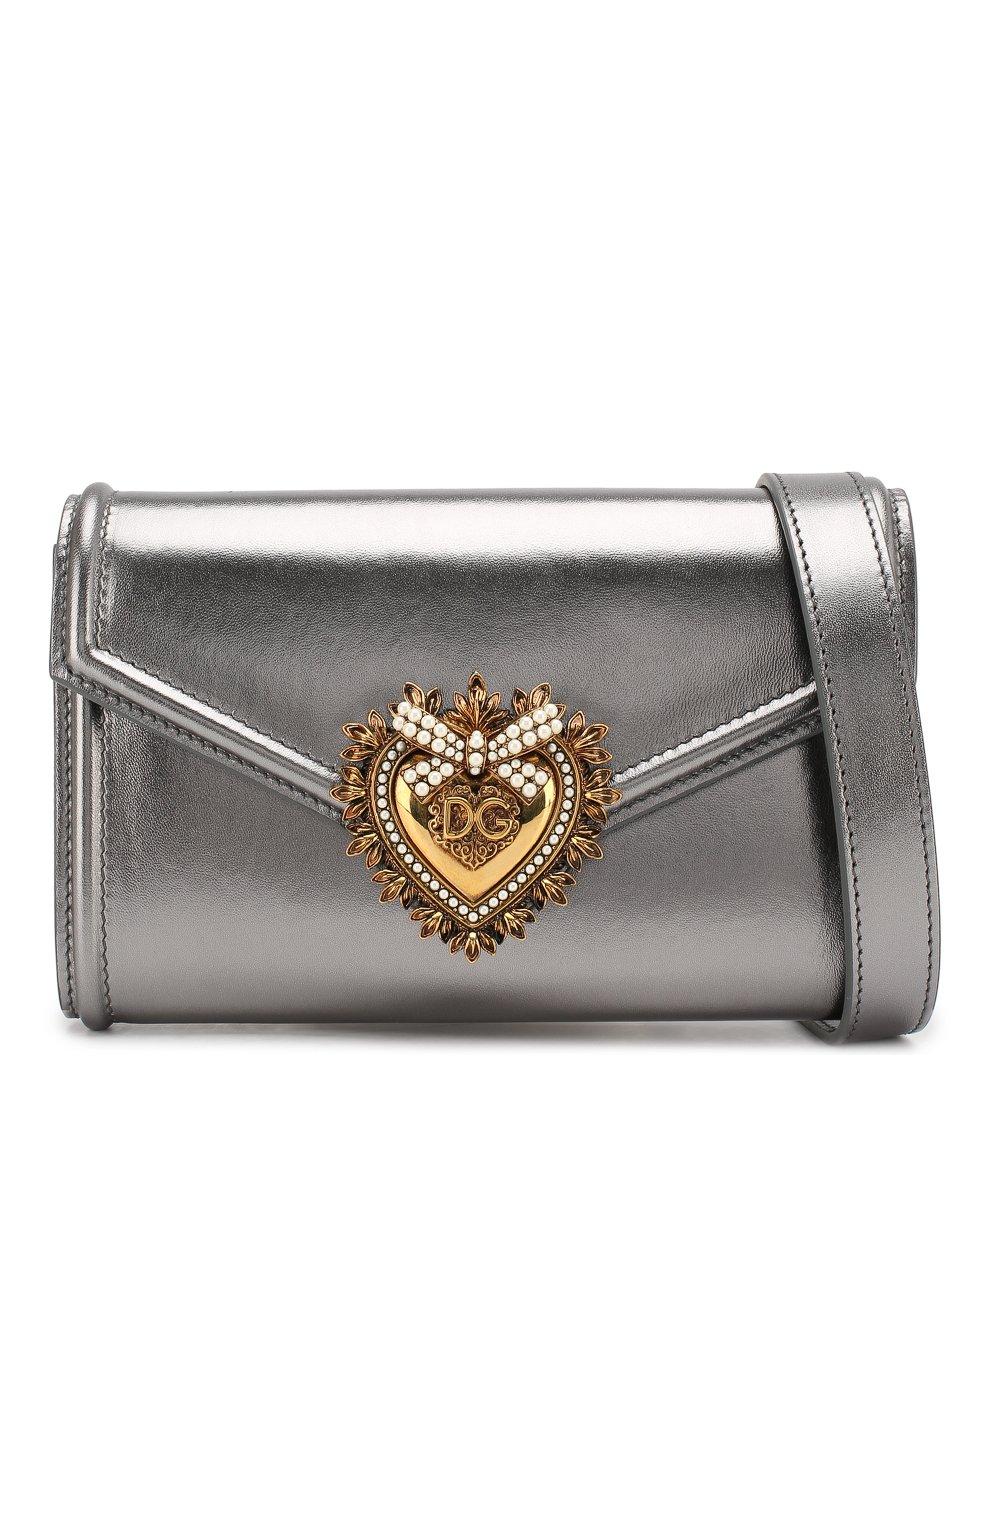 Поясная сумка Devotion Dolce & Gabbana серебряная | Фото №5